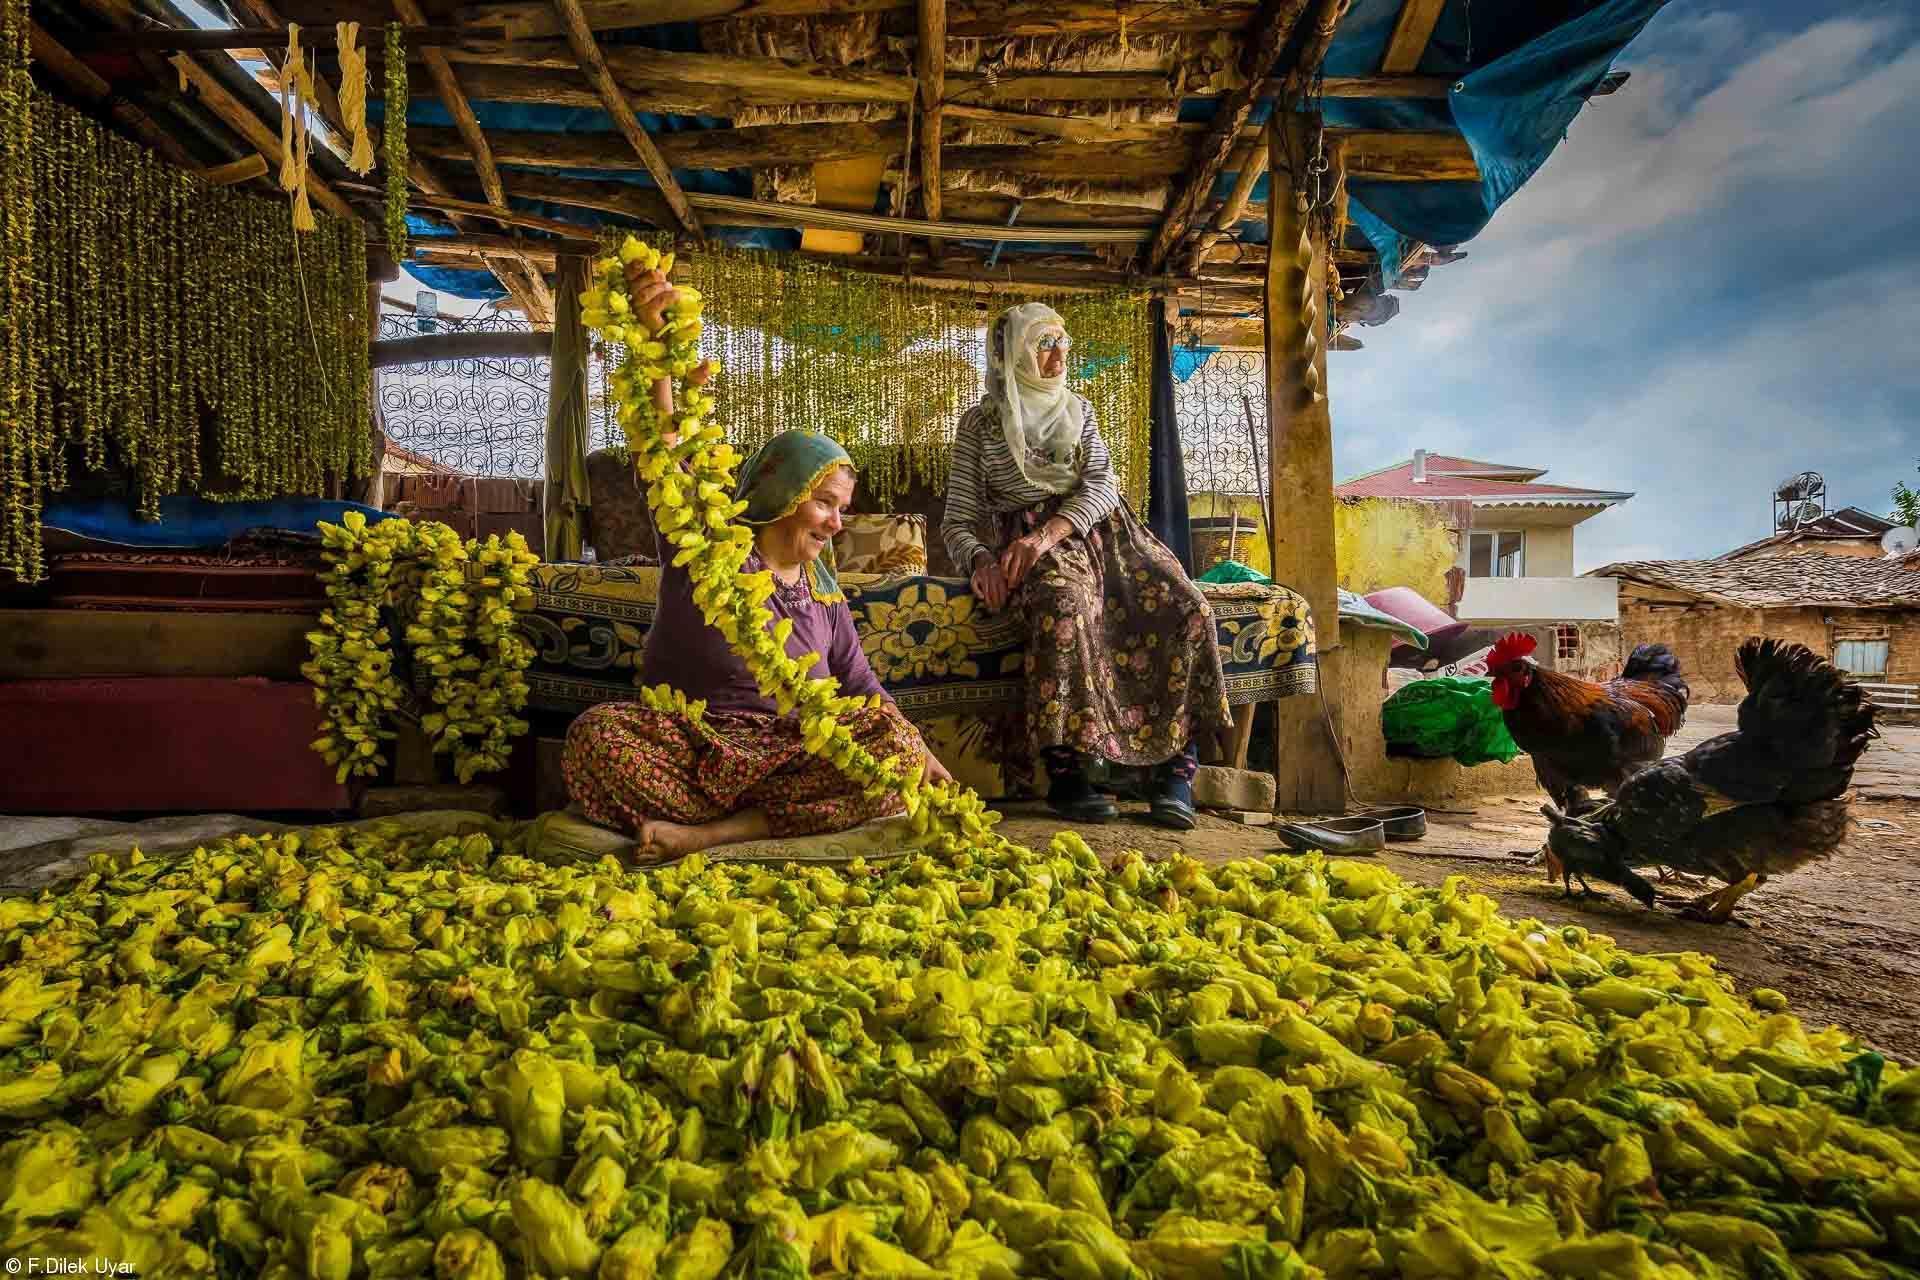 2. Harvest - F.Dilek Uyar Drying Okra